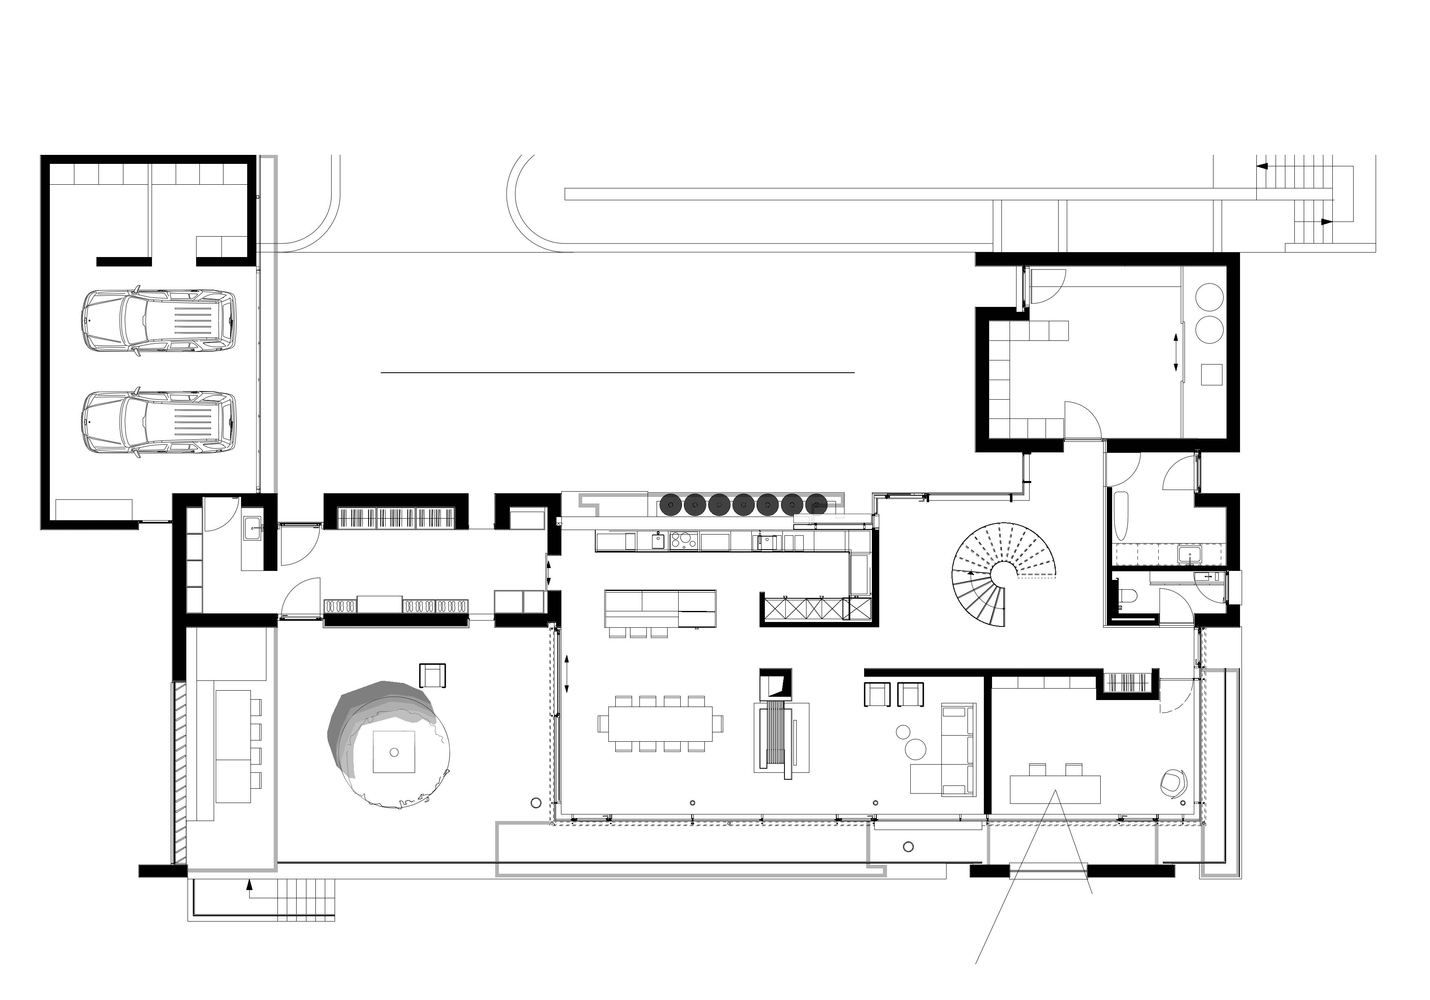 Gallery of house fmb fuchs wacker architekten 31 plantas pinterest house ground floor - Fmb architekten ...